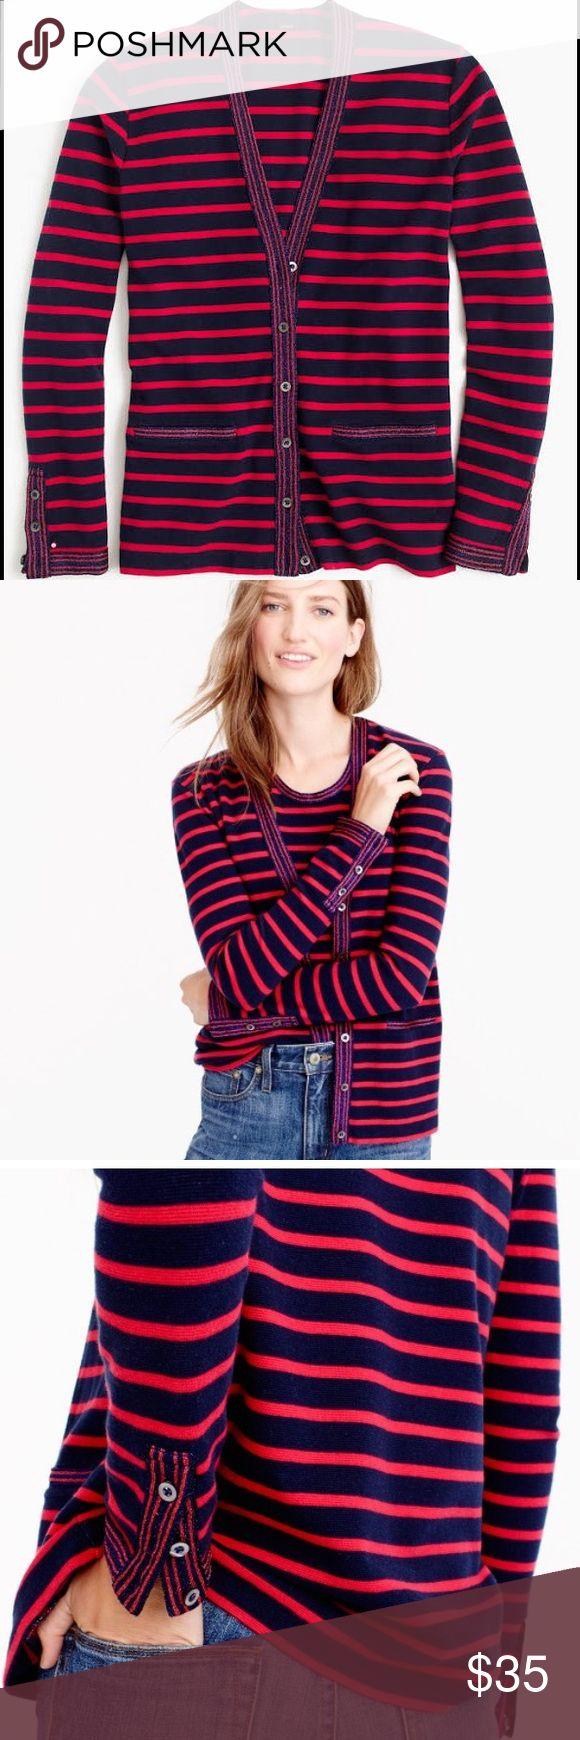 "NWT J. Crew Metallic Trim Striped Cardigan A cute striped cardigan with metallic trim used from a vintage sample.  Cotton/Spandex.  True to size.  Length: 24 1/2"". J. Crew Sweaters Cardigans"